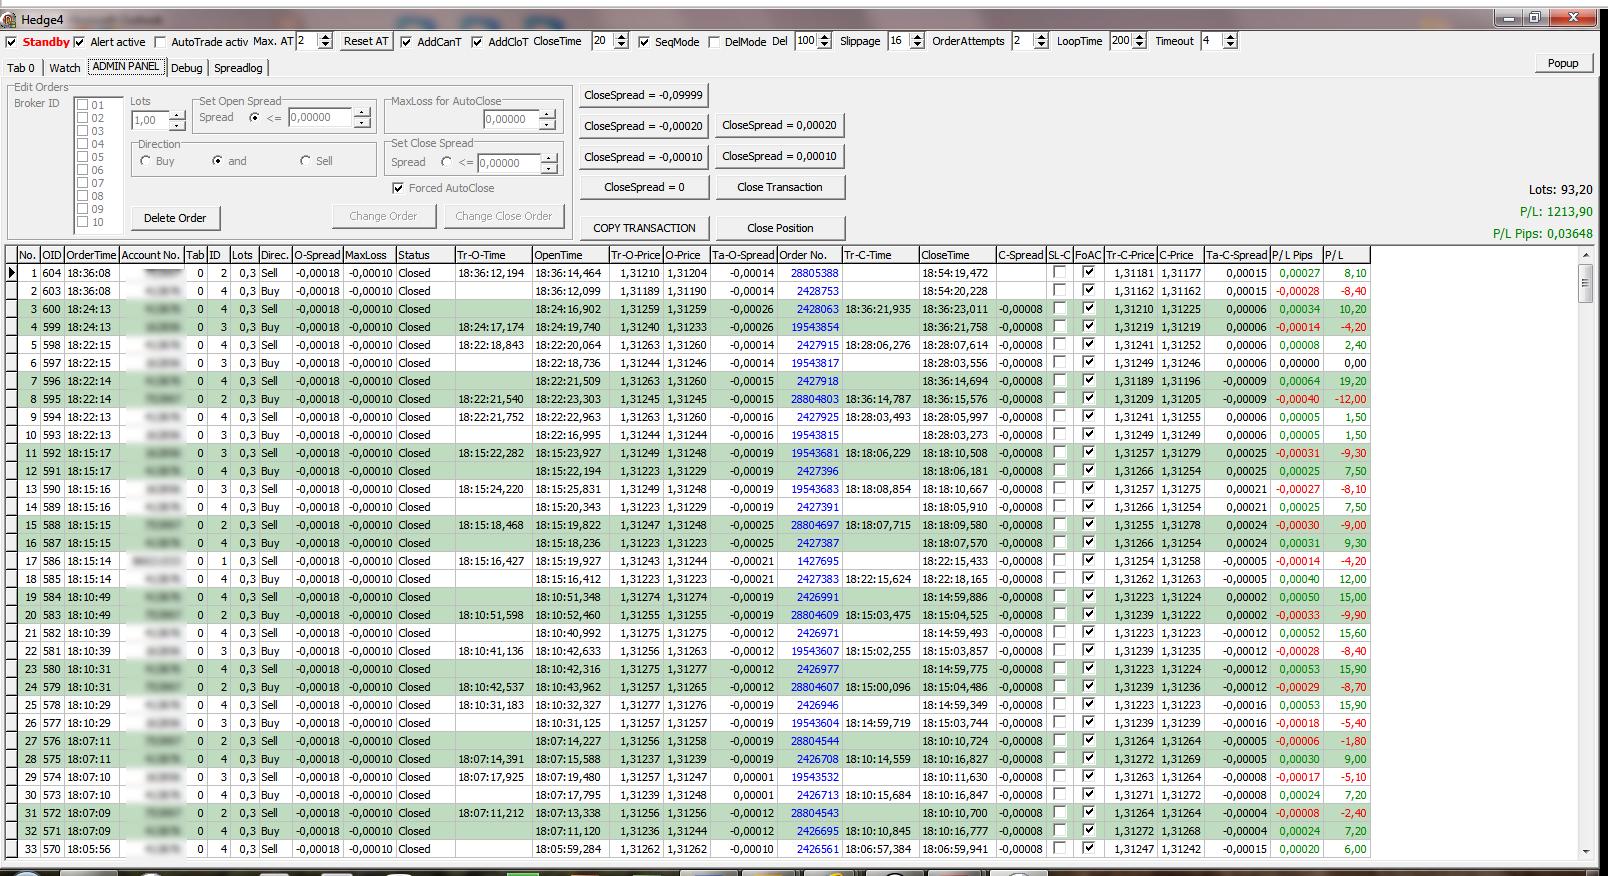 PERFORMANCE - Hedge4 FIX API MT4 Arbitrage